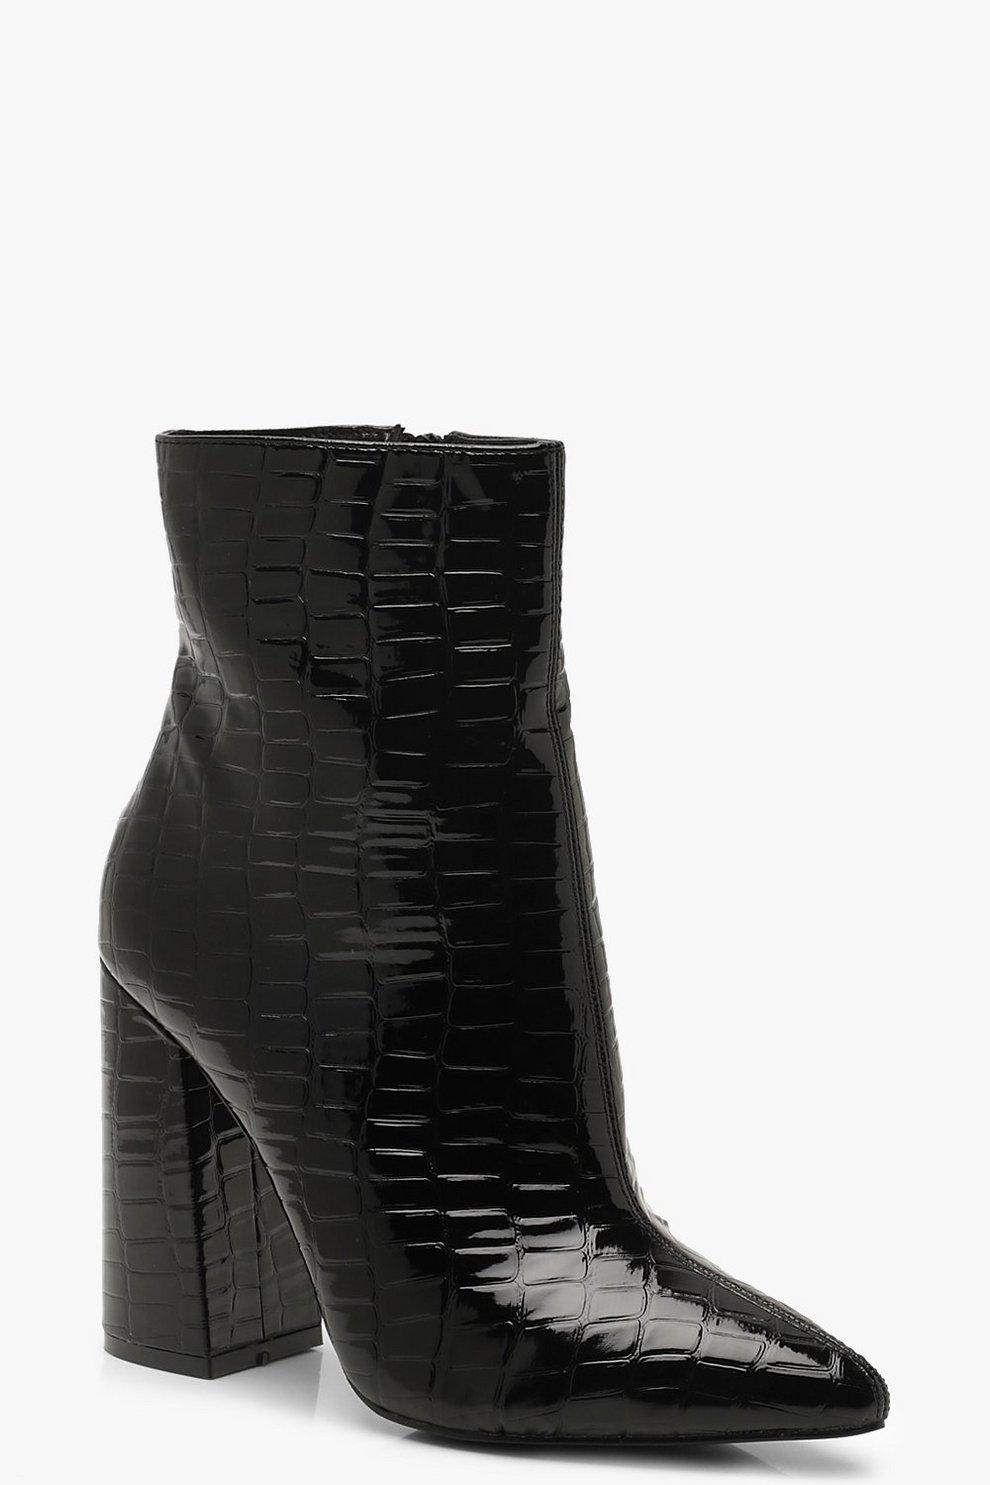 4dcb81787e3f Croc Block Heel Sock Boots